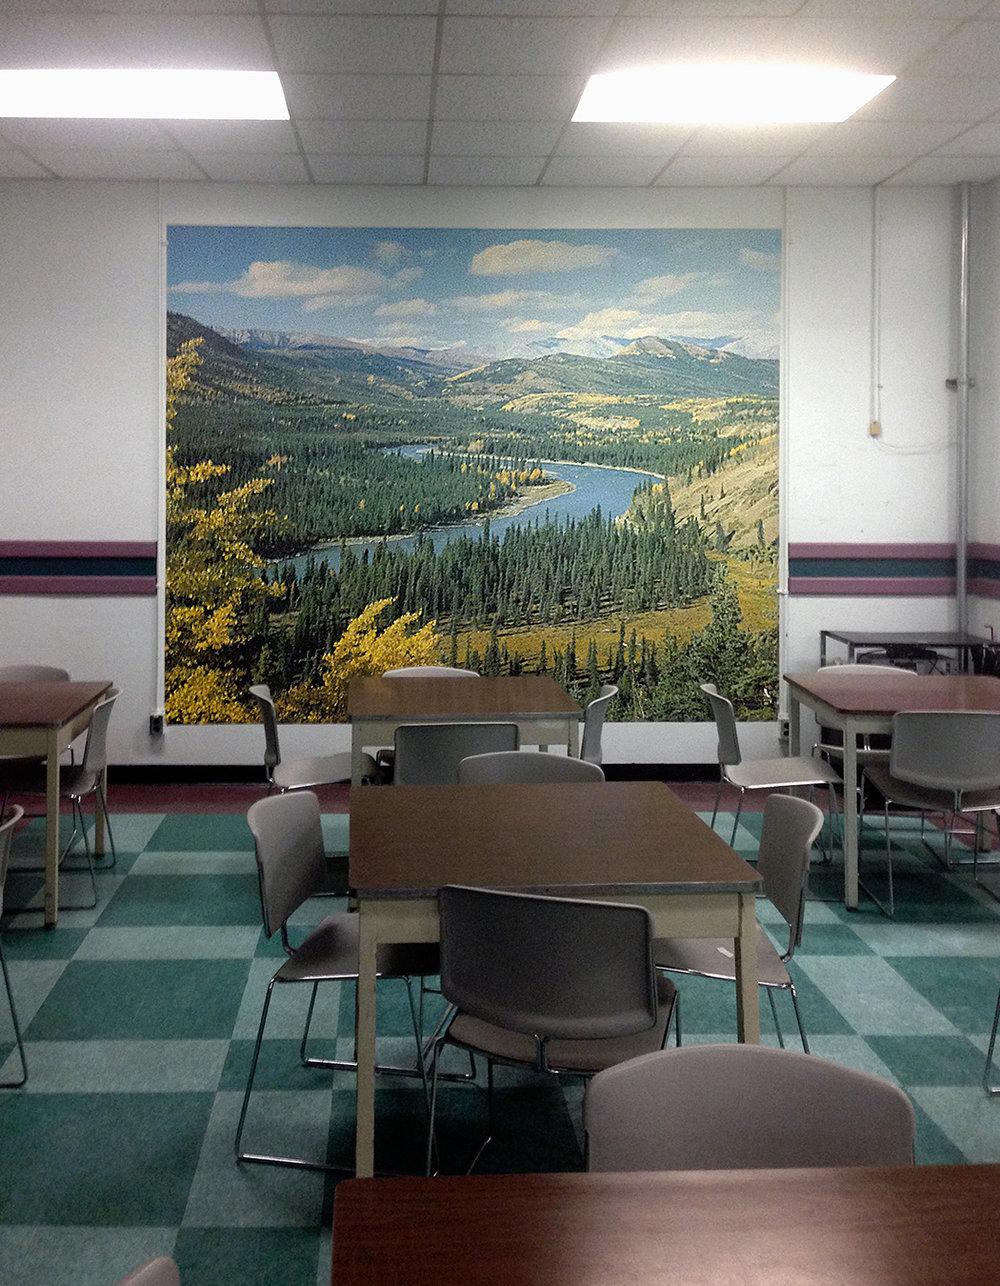 © Douglas Moffat,Cafeteria - Central Emergency Government Headquarters, CFB Carp, Ontario(2015).